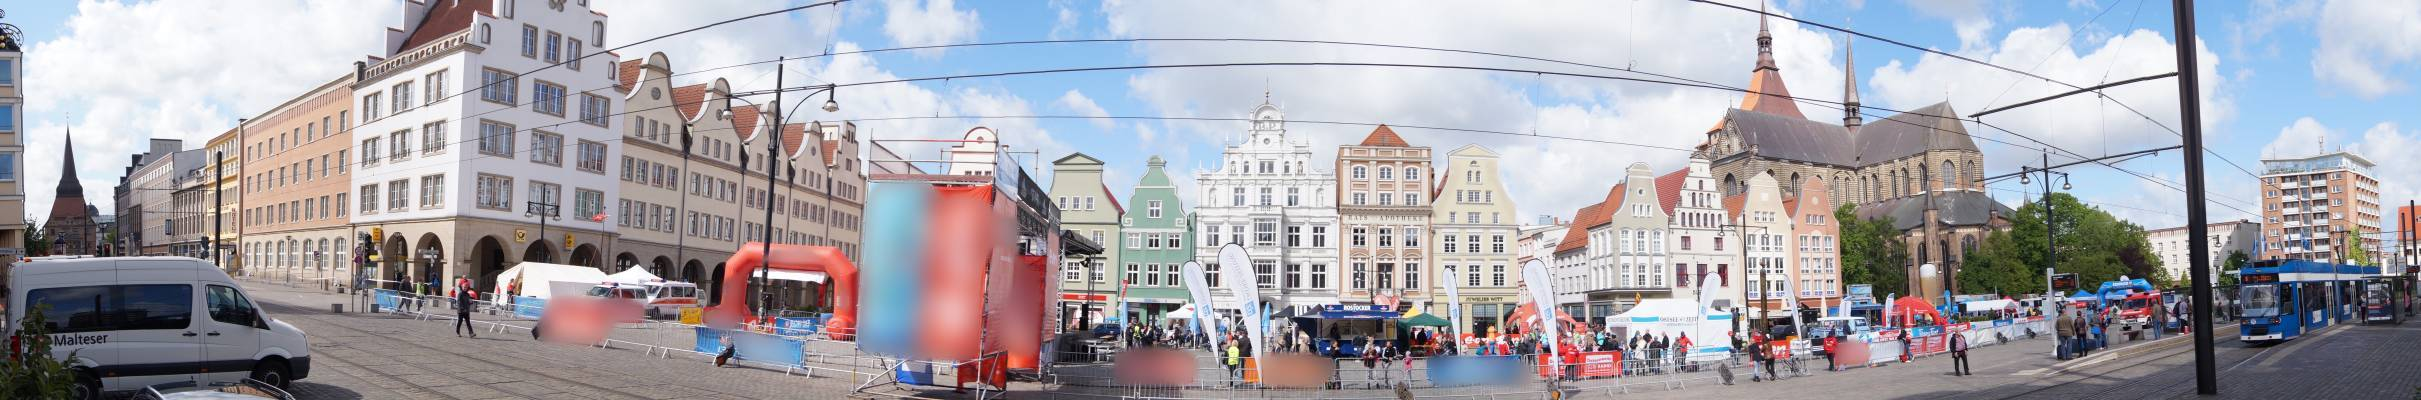 Halbmarathonlauf beim 23. Rostocker Citylauf 2015